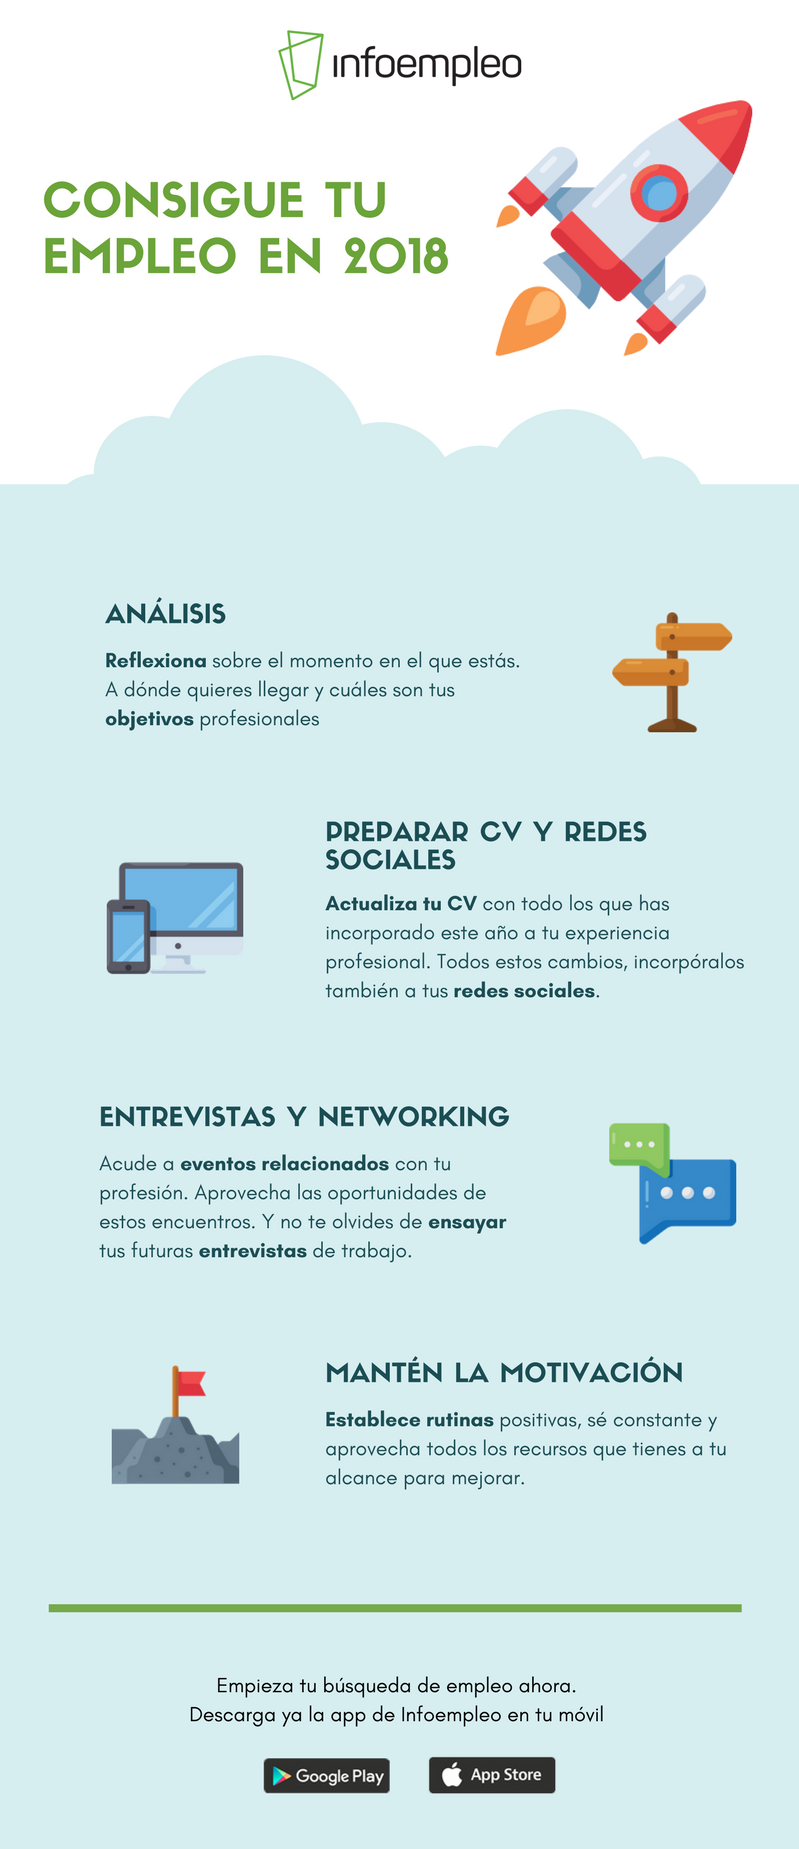 infografía encontrar empleo en 2018